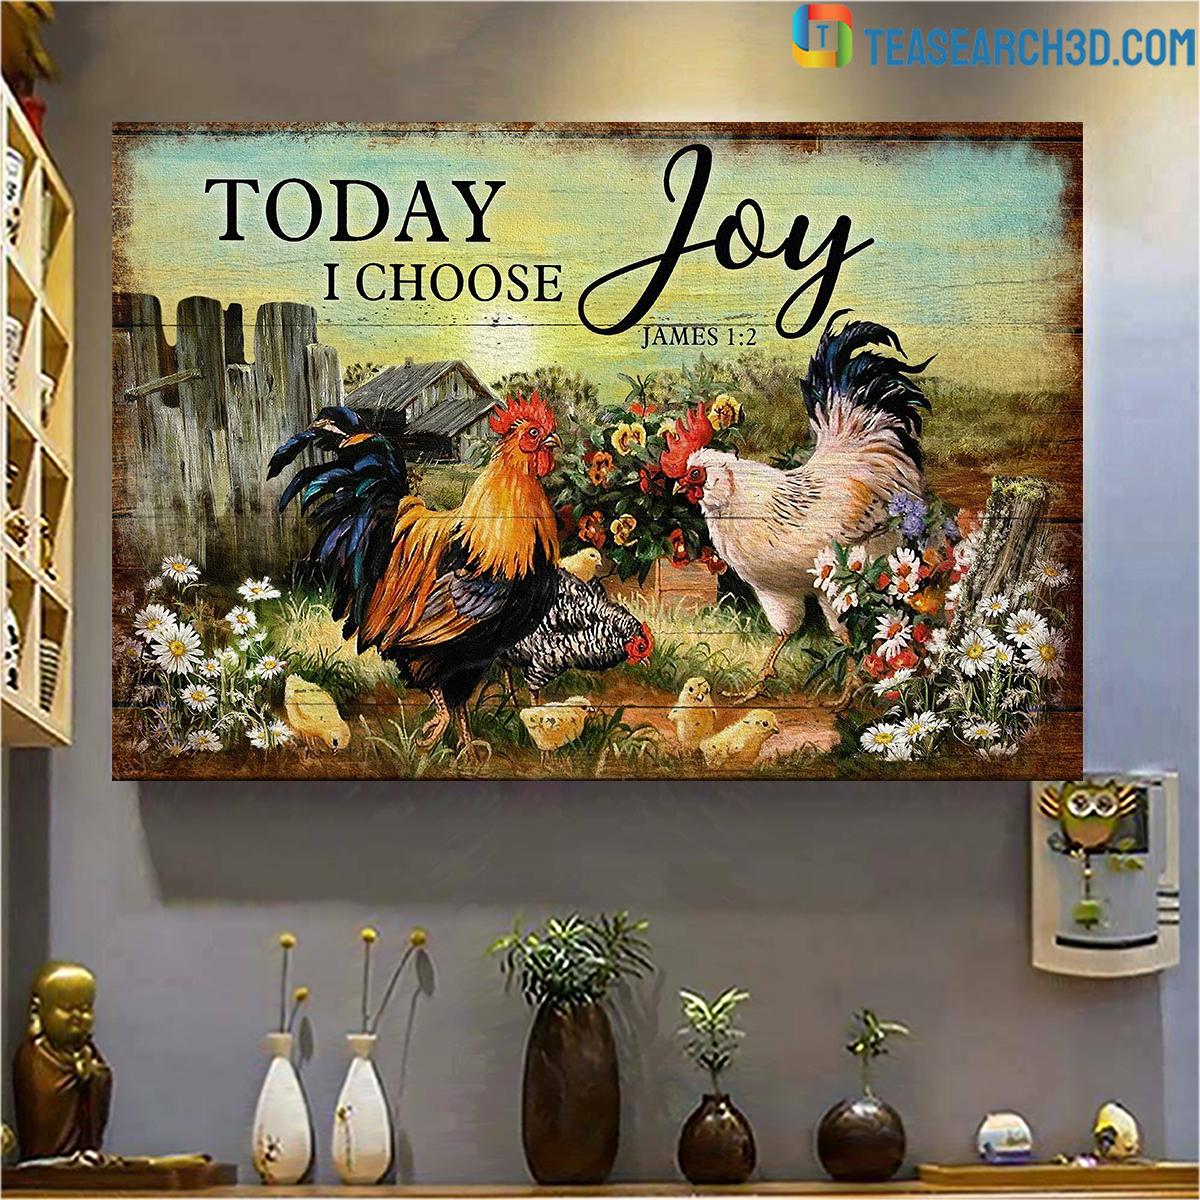 Chicken family on farm today I choose joy jesus canvas